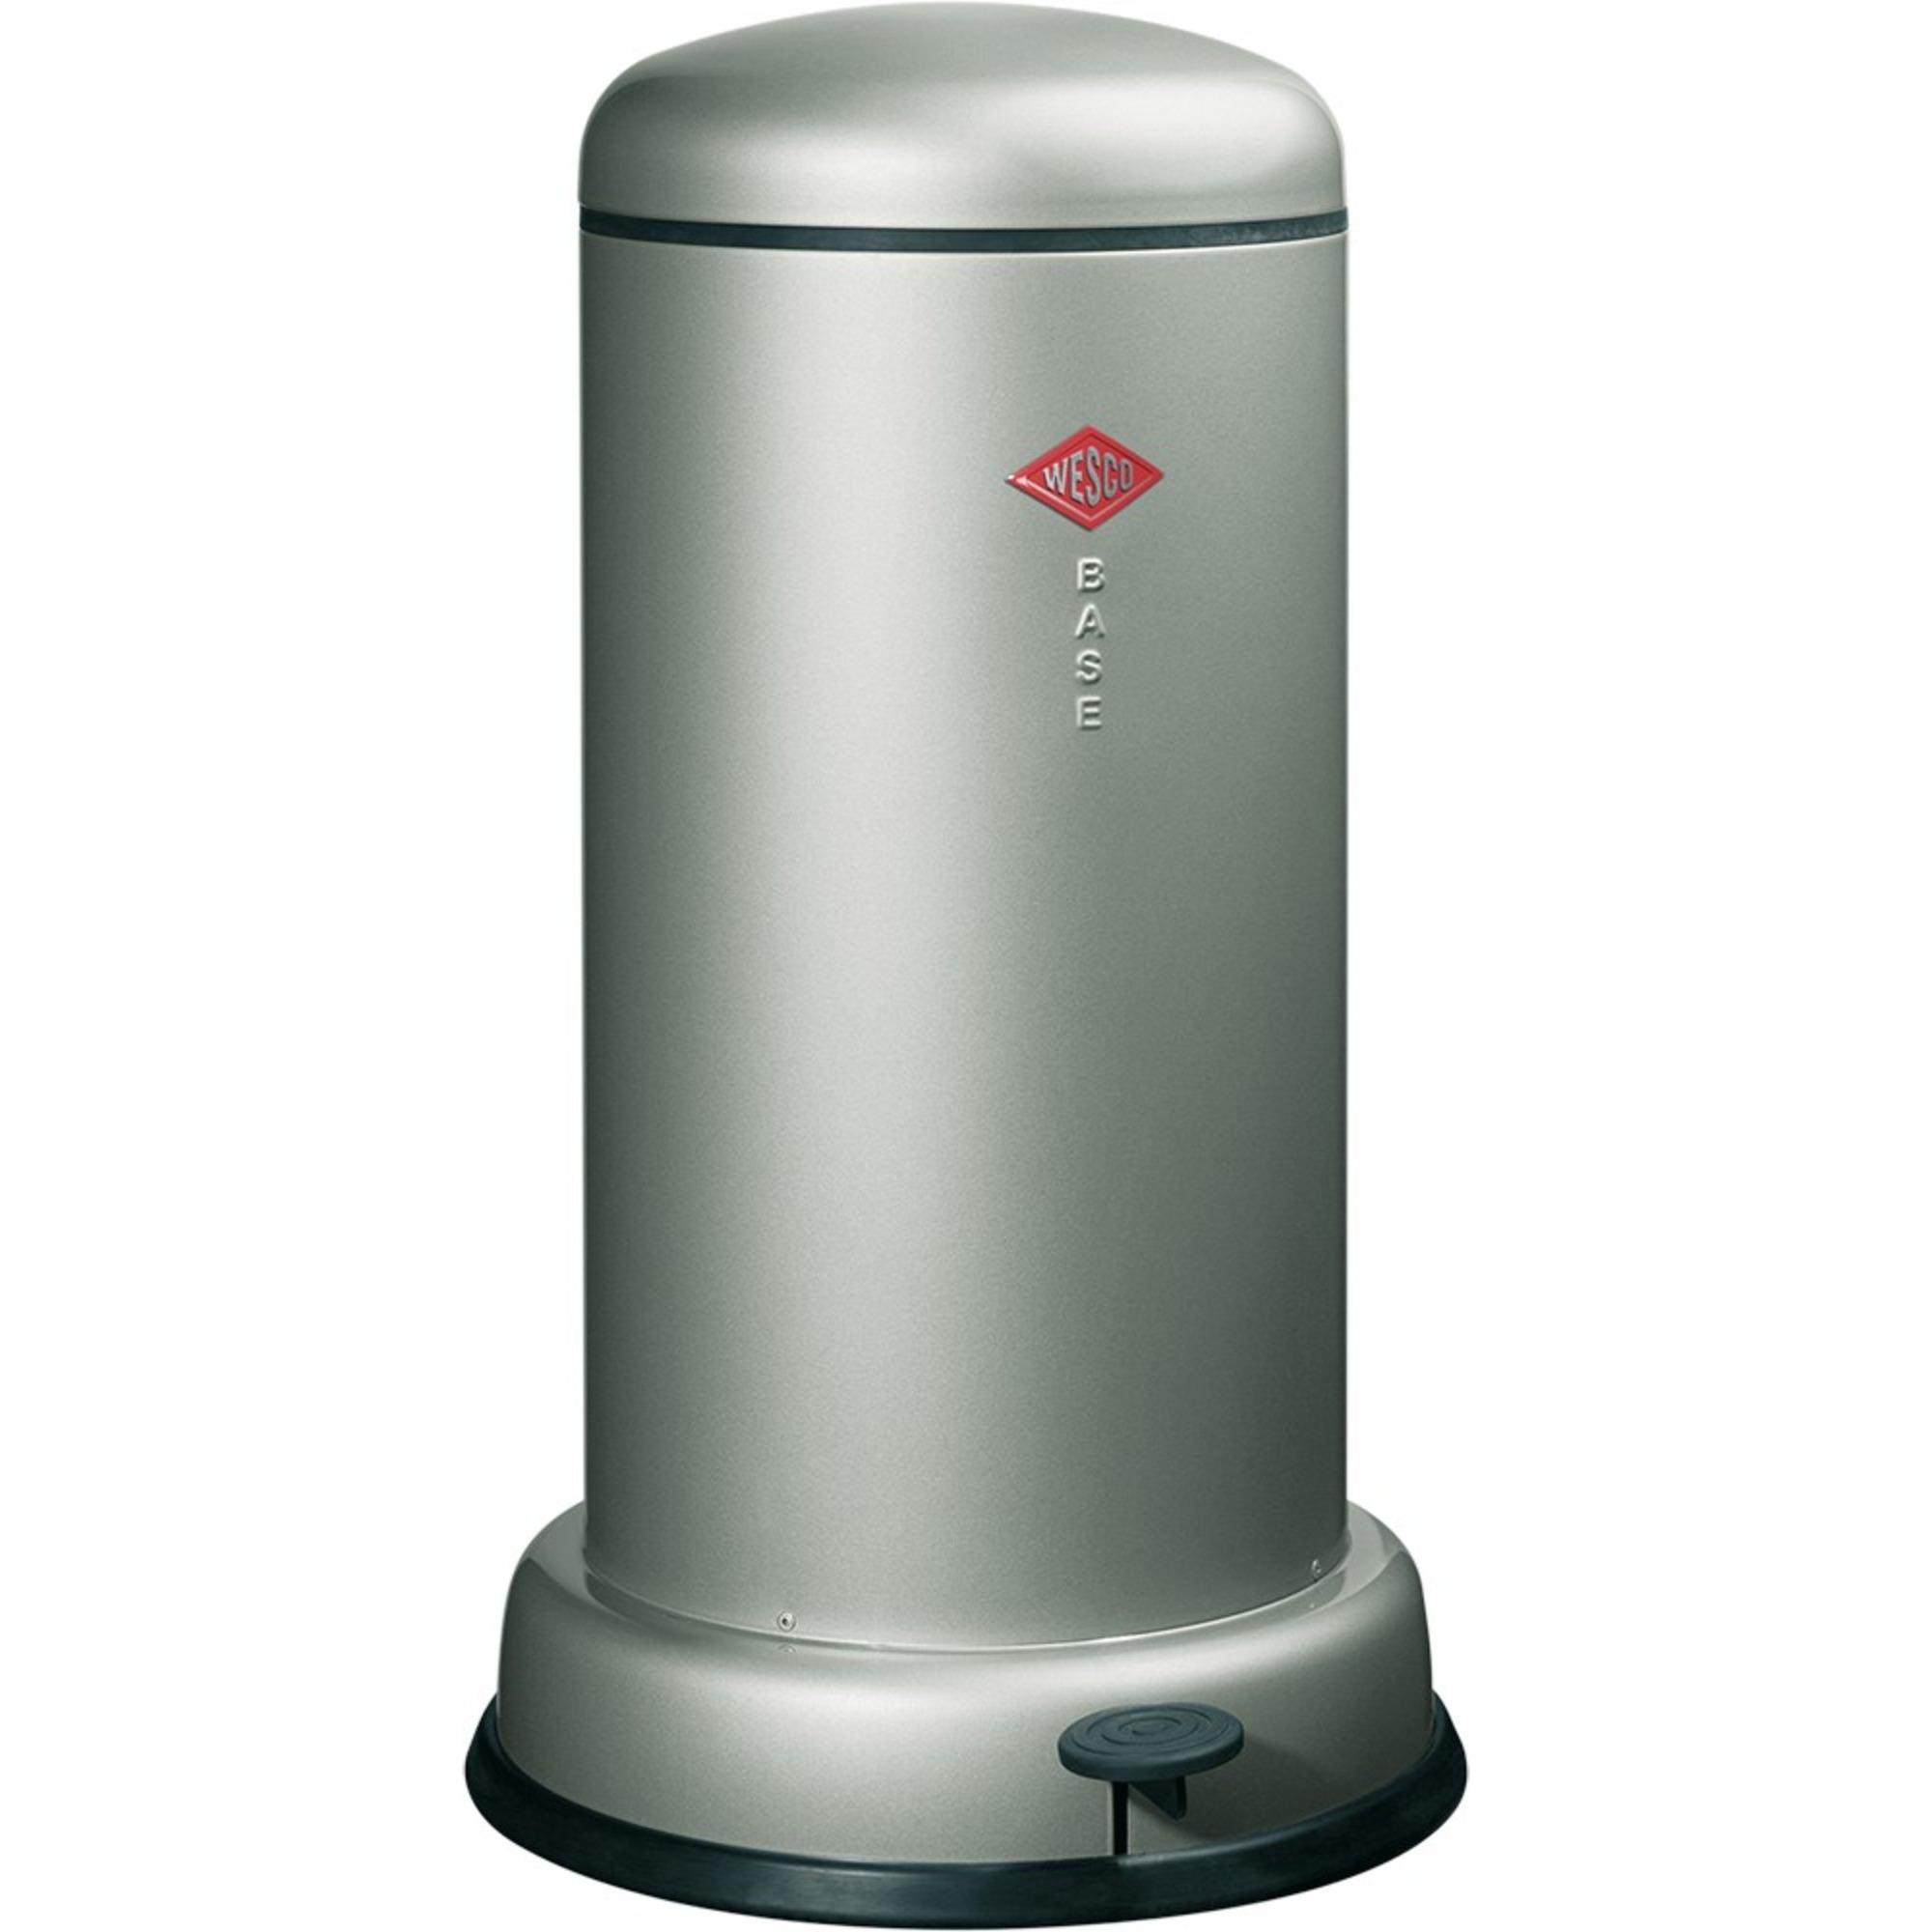 Wesco 20 liter Baseboy Ljusgrå